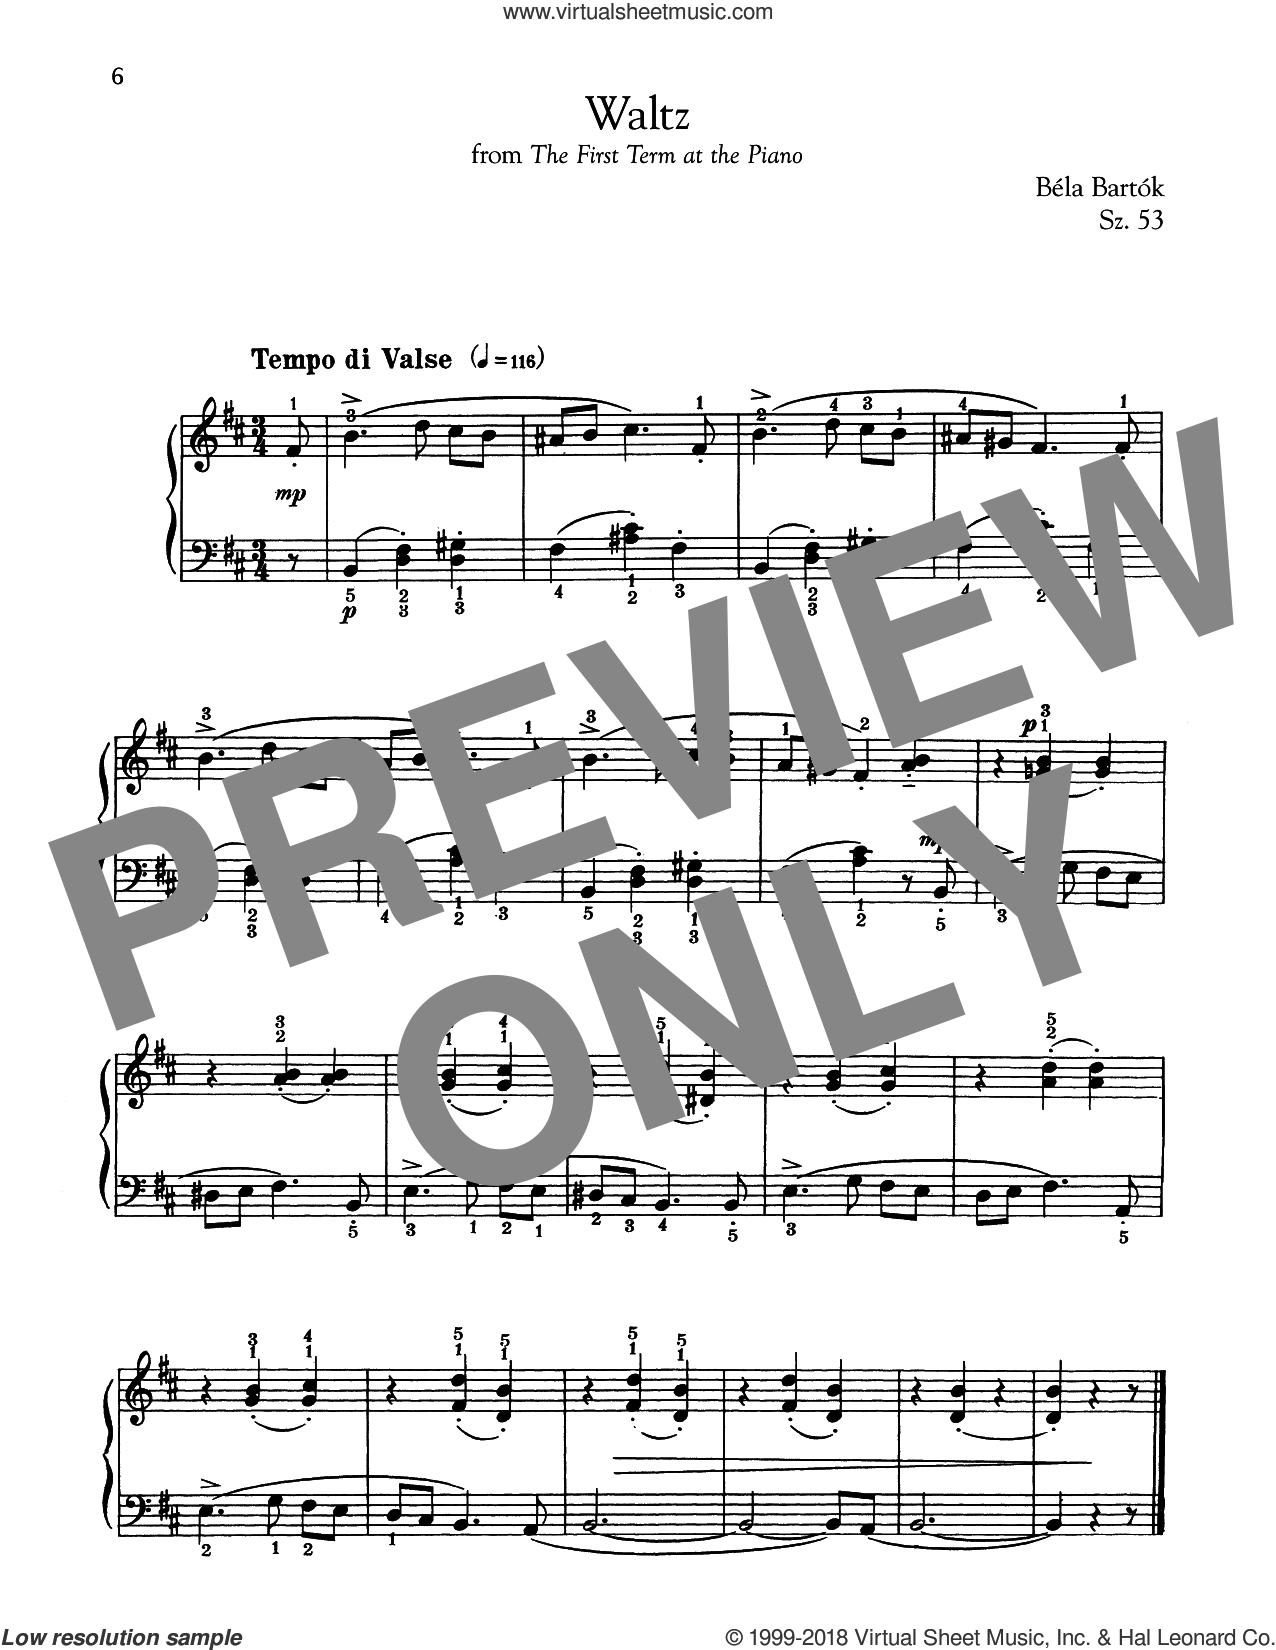 Waltz sheet music for piano solo by Bela Bartok and Bela Bartok, classical score, intermediate skill level